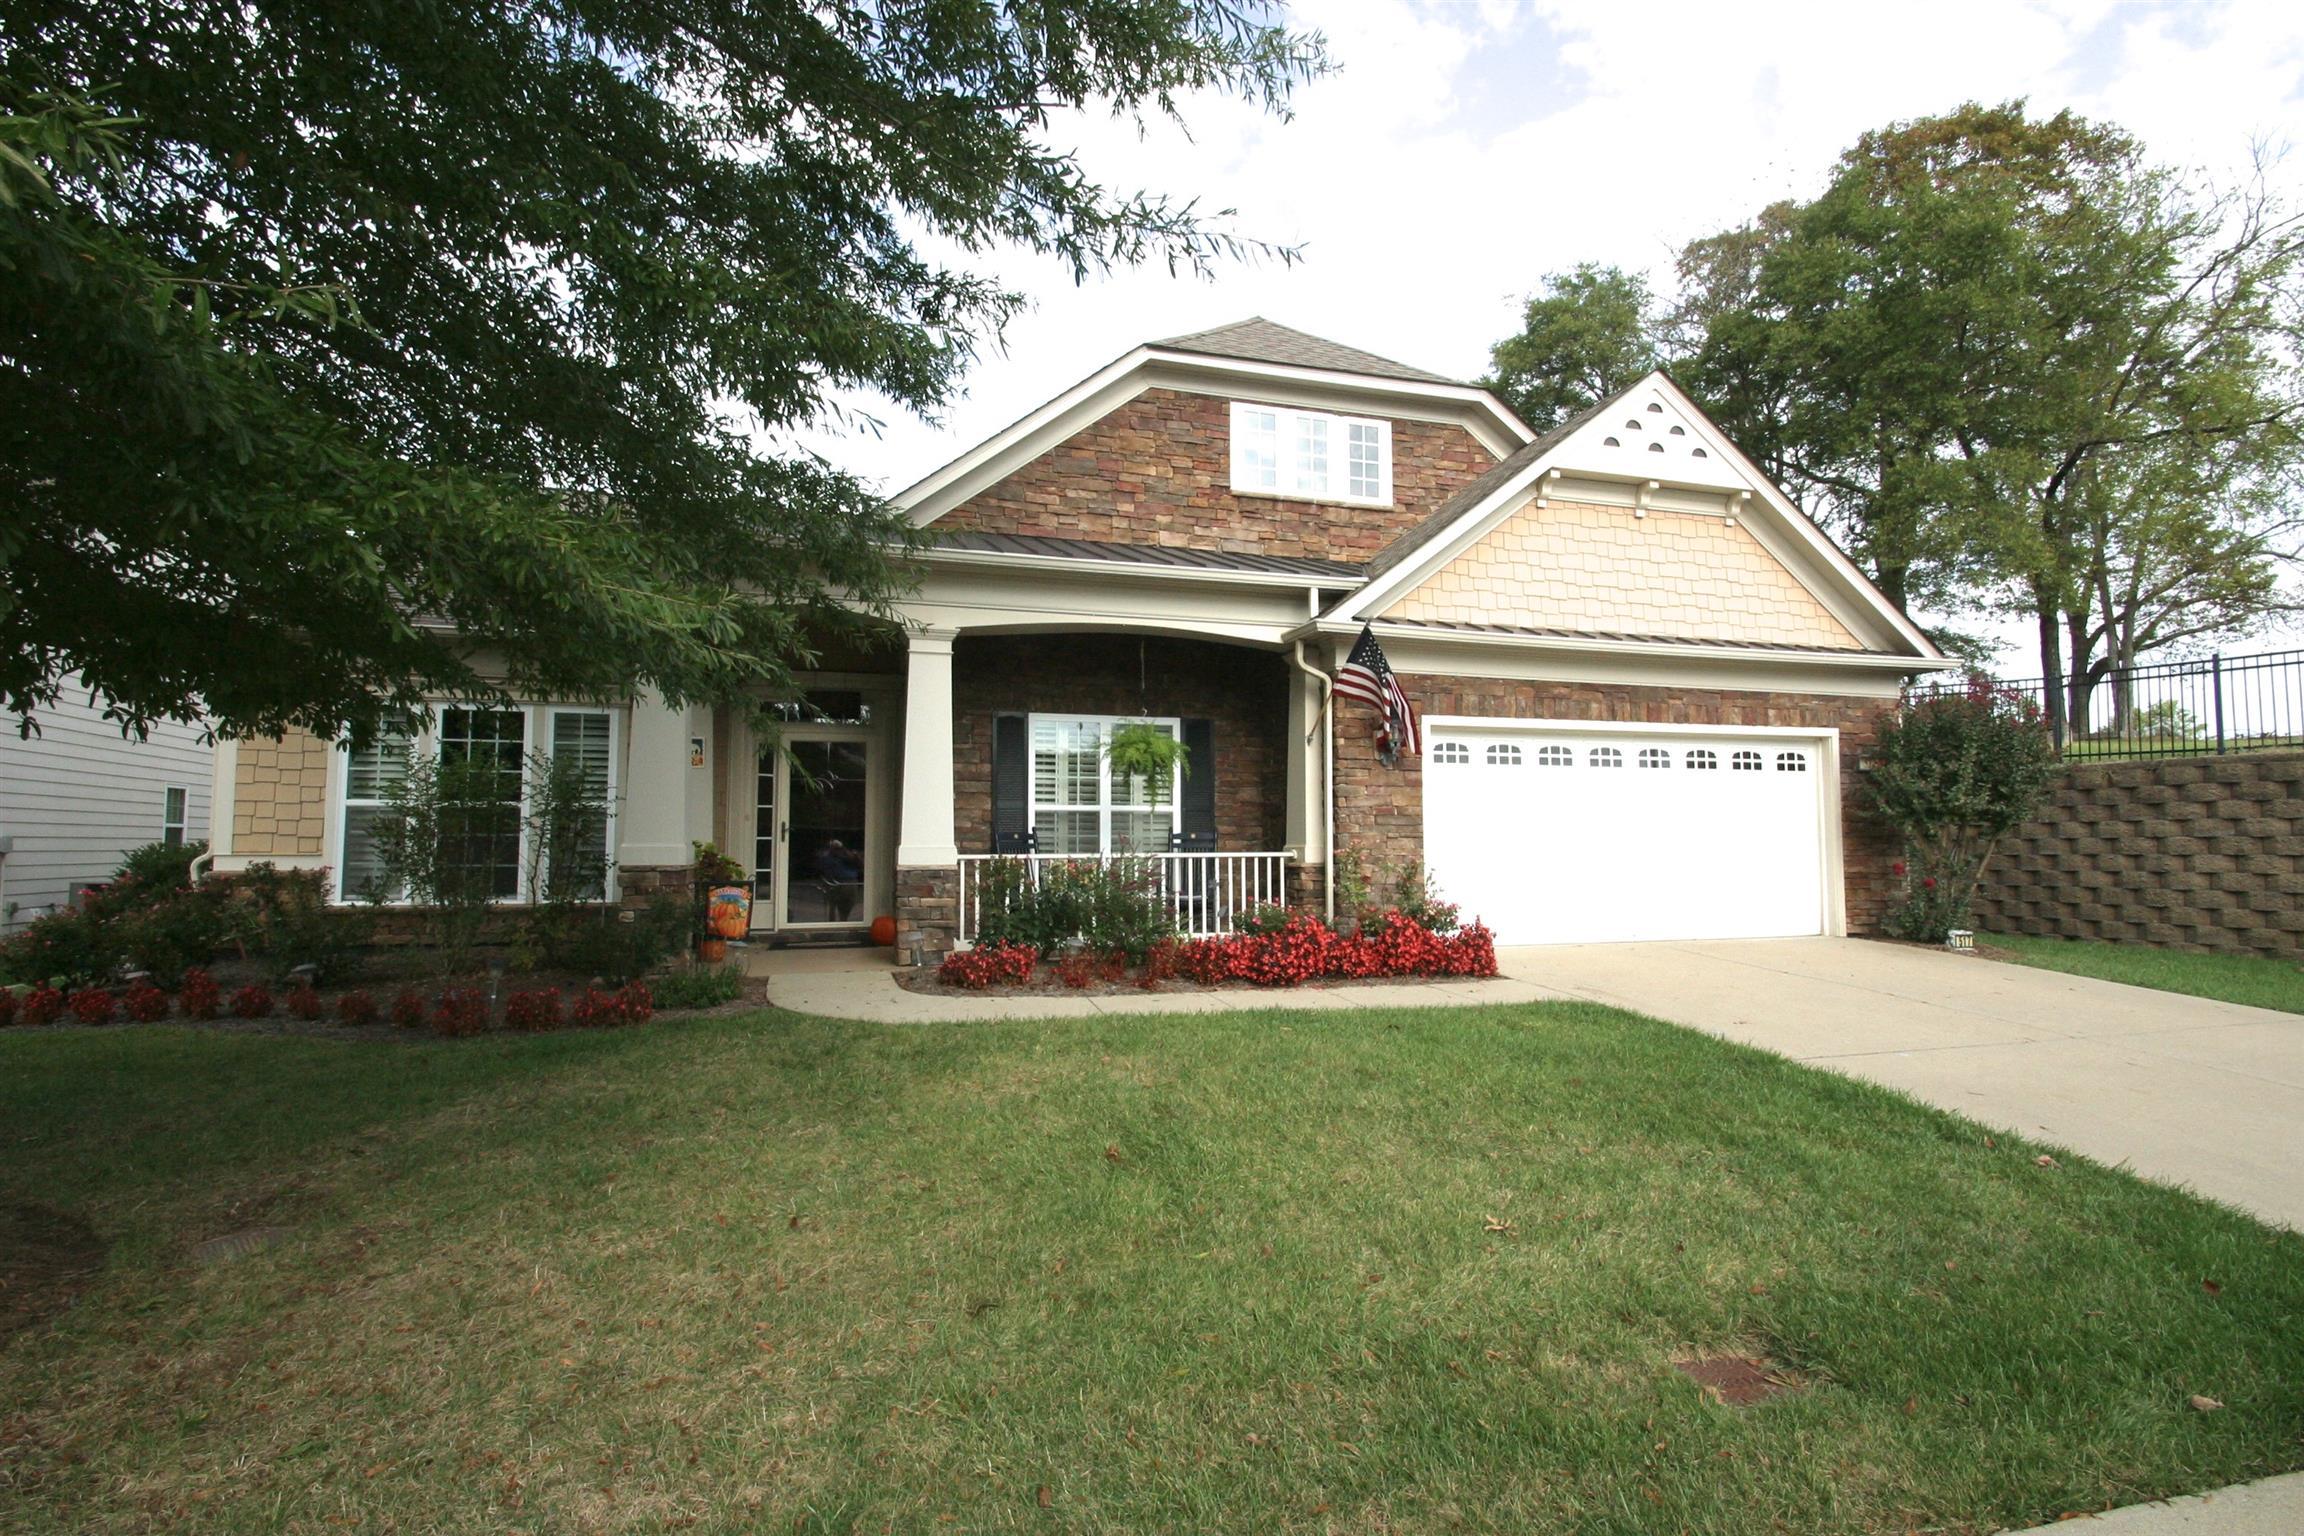 517 Bugler Rd, Mount Juliet, TN 37122 - Mount Juliet, TN real estate listing